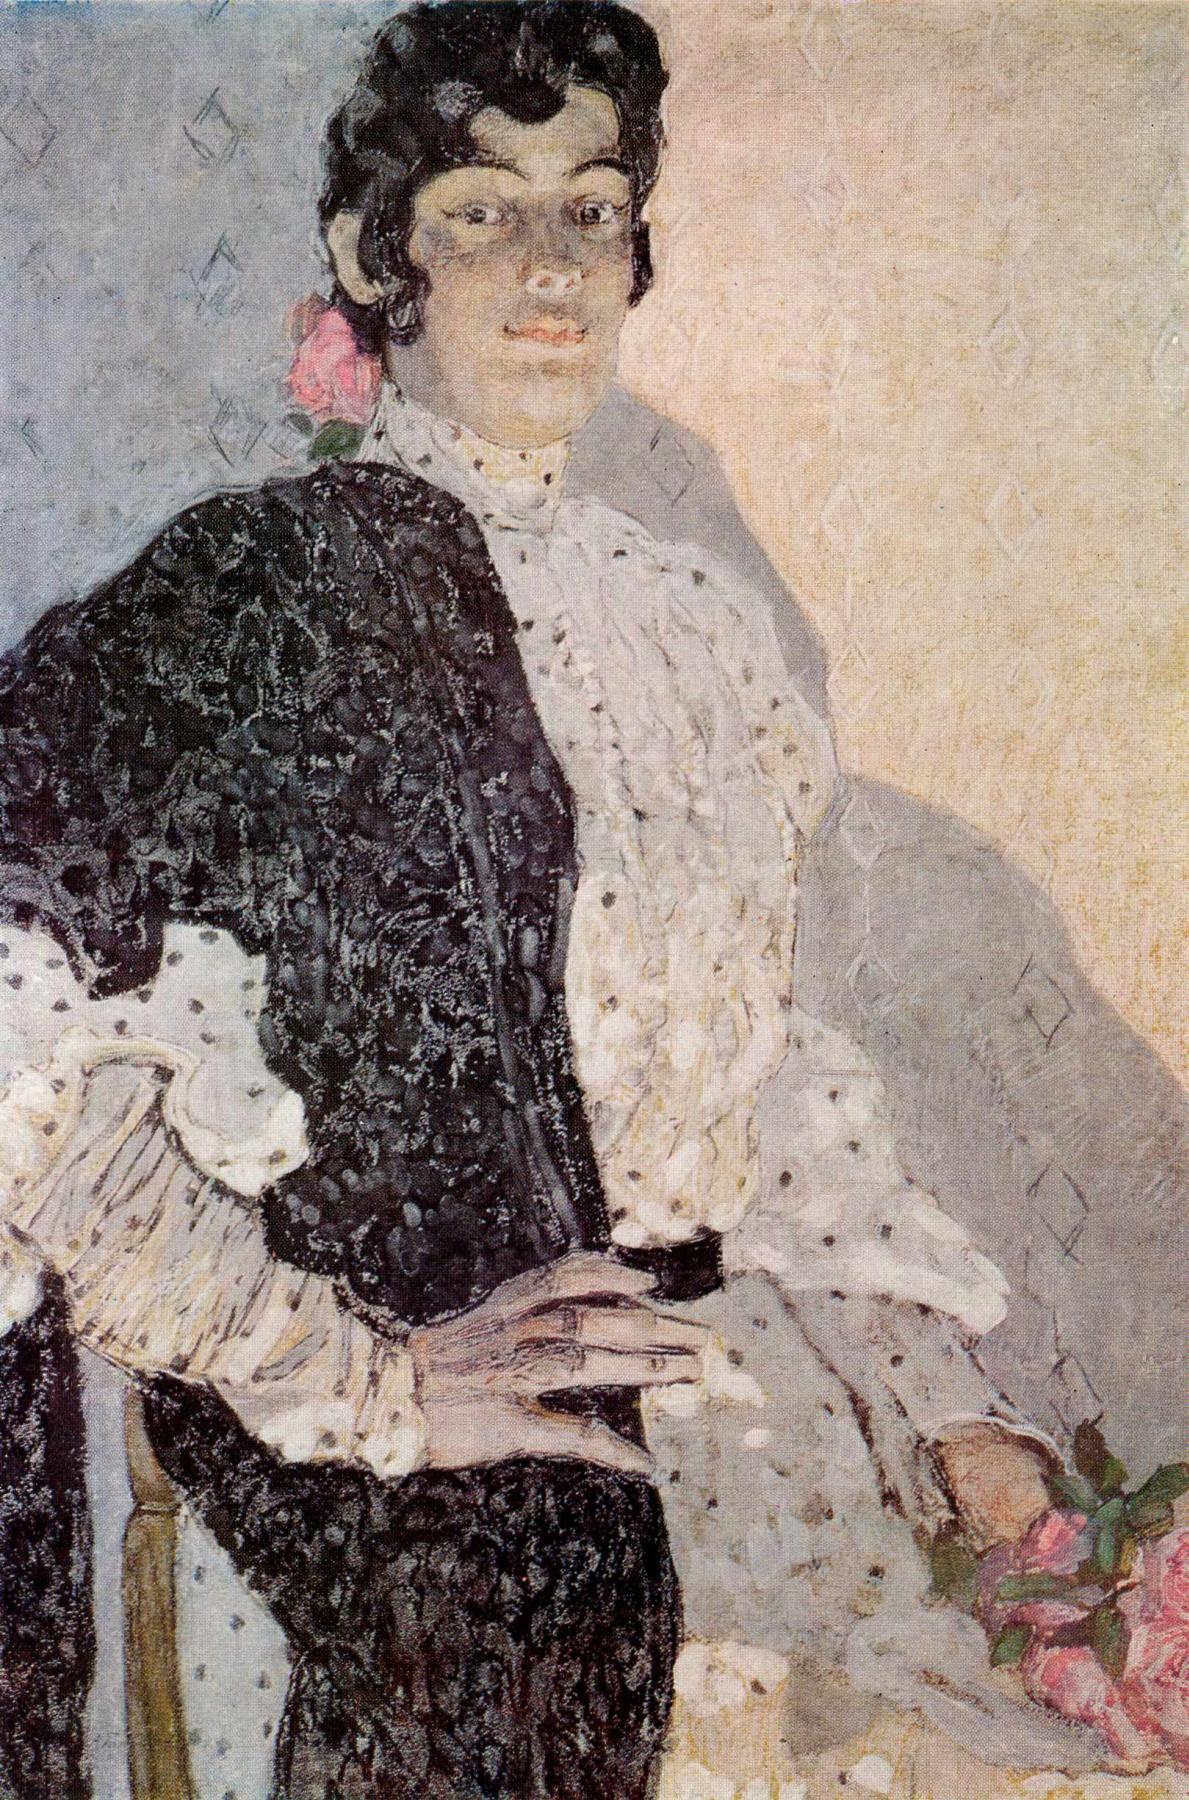 Alexander Yakovlevich Golovin. Spanish woman with black shawl